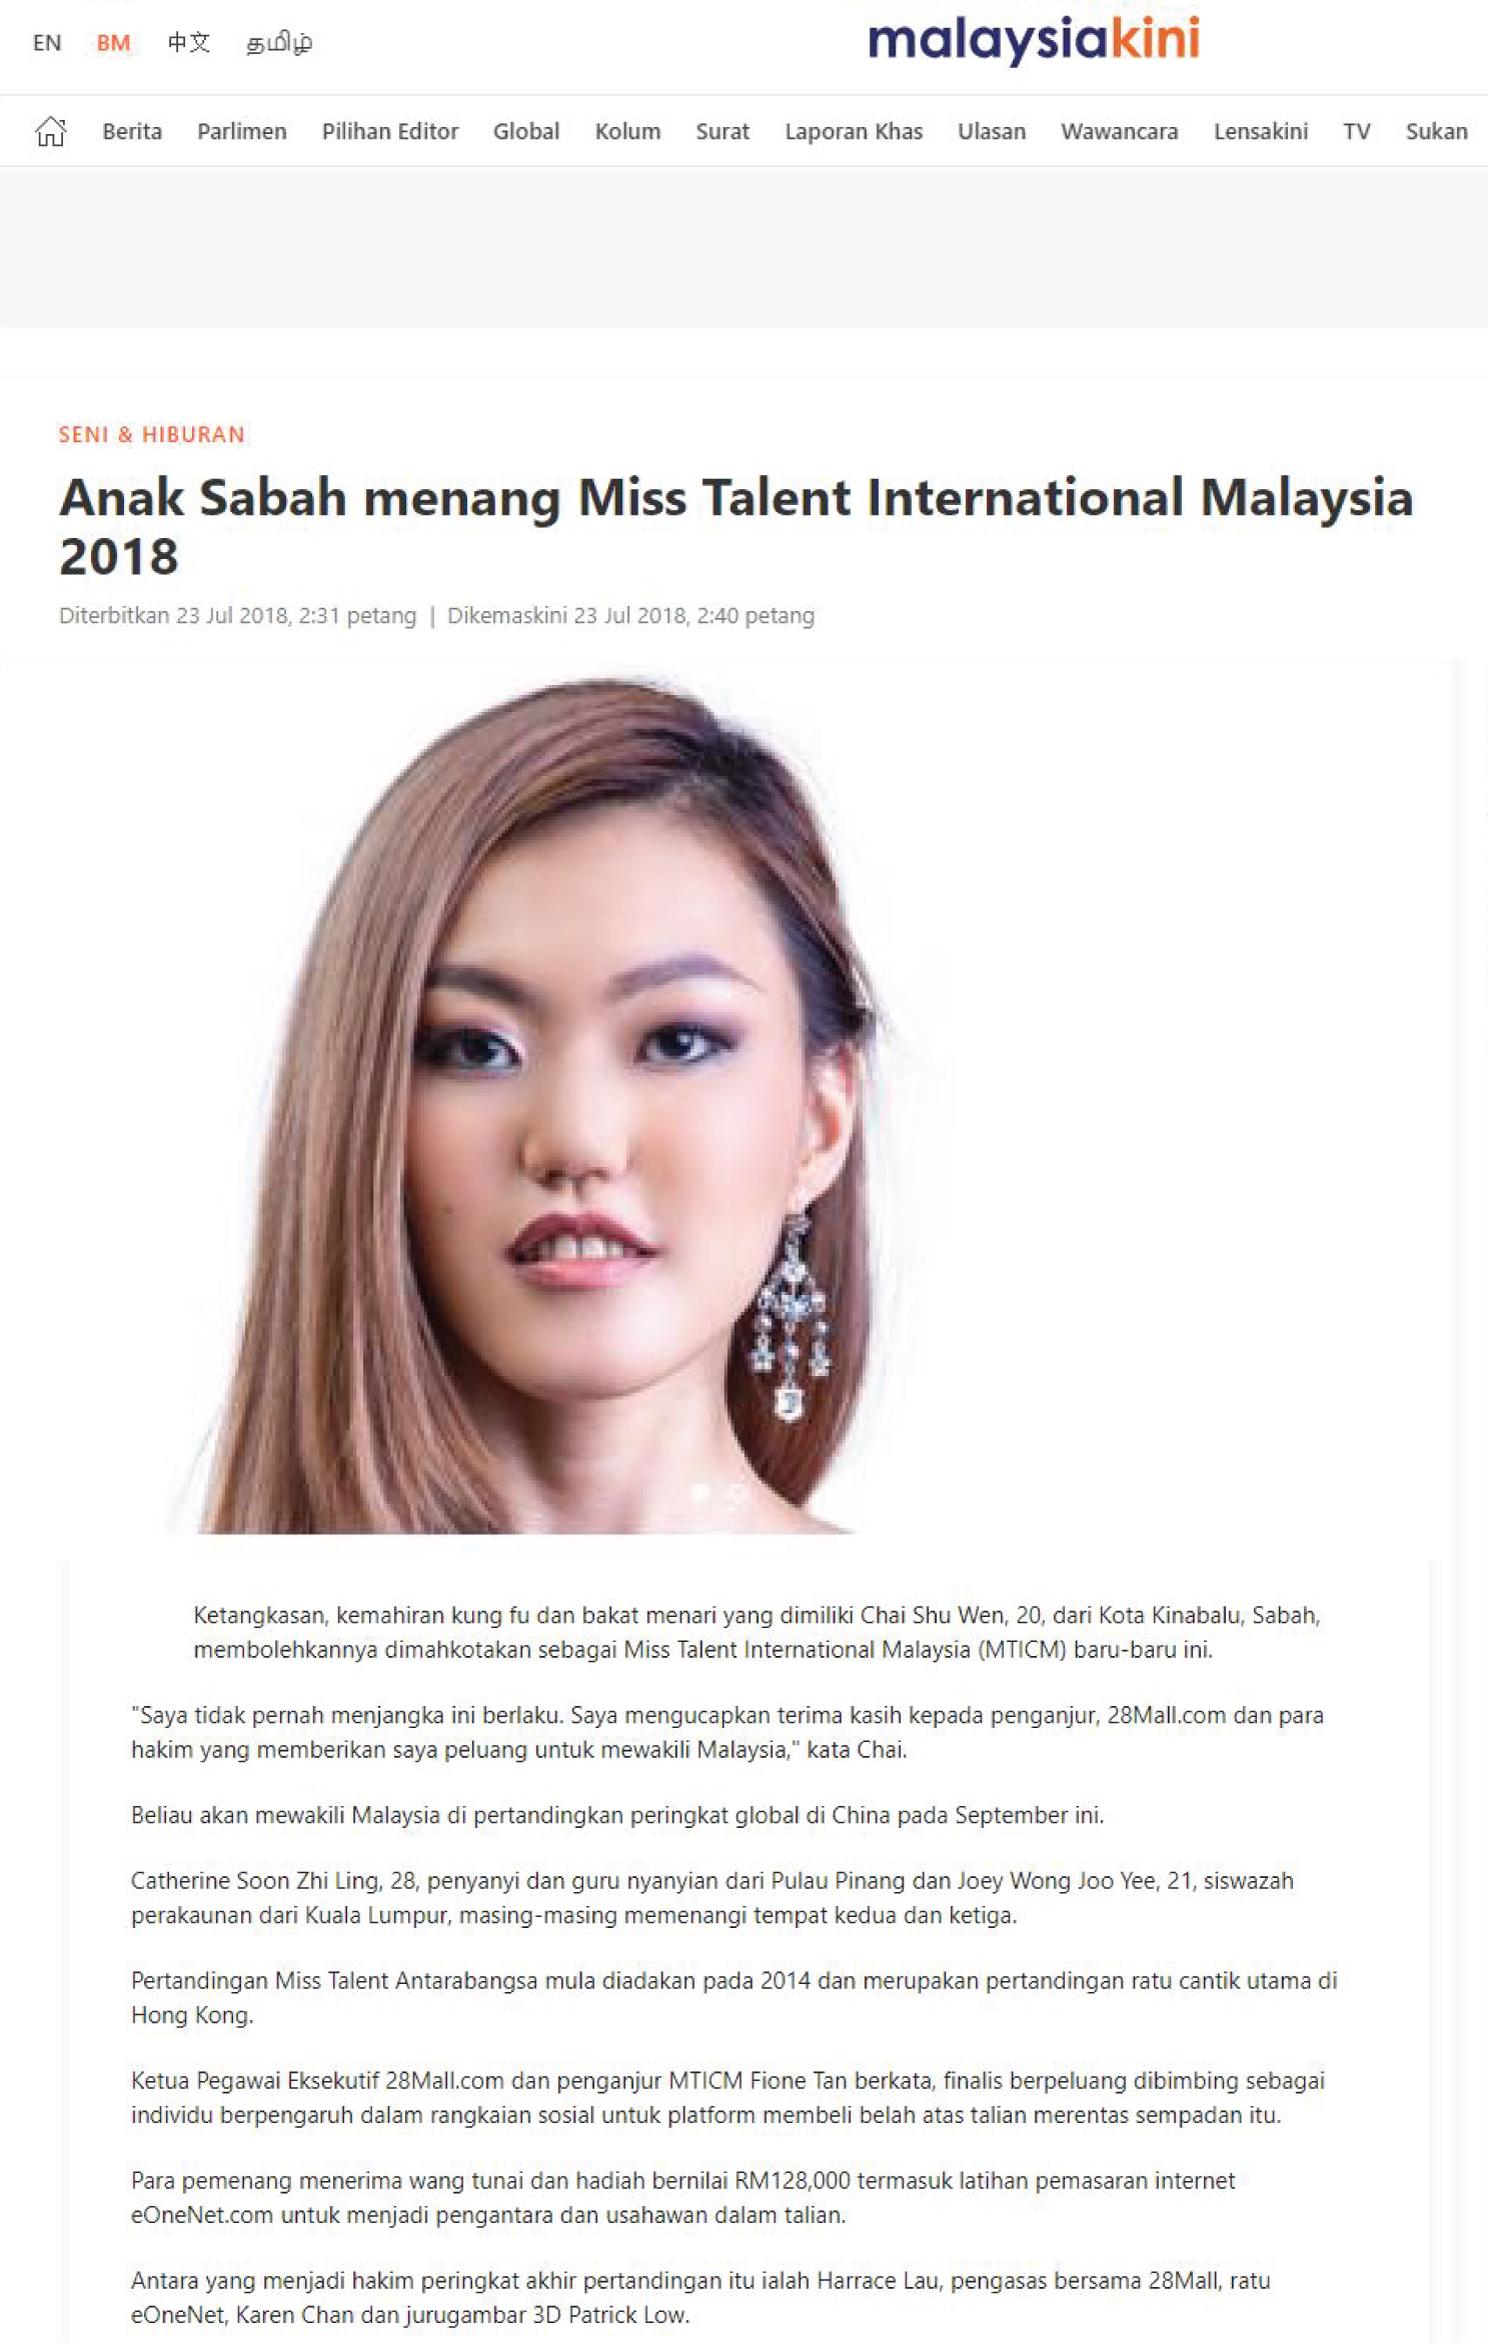 Anak Sabah menang Miss Talent International Malaysia 2018 by MalaysiaKini